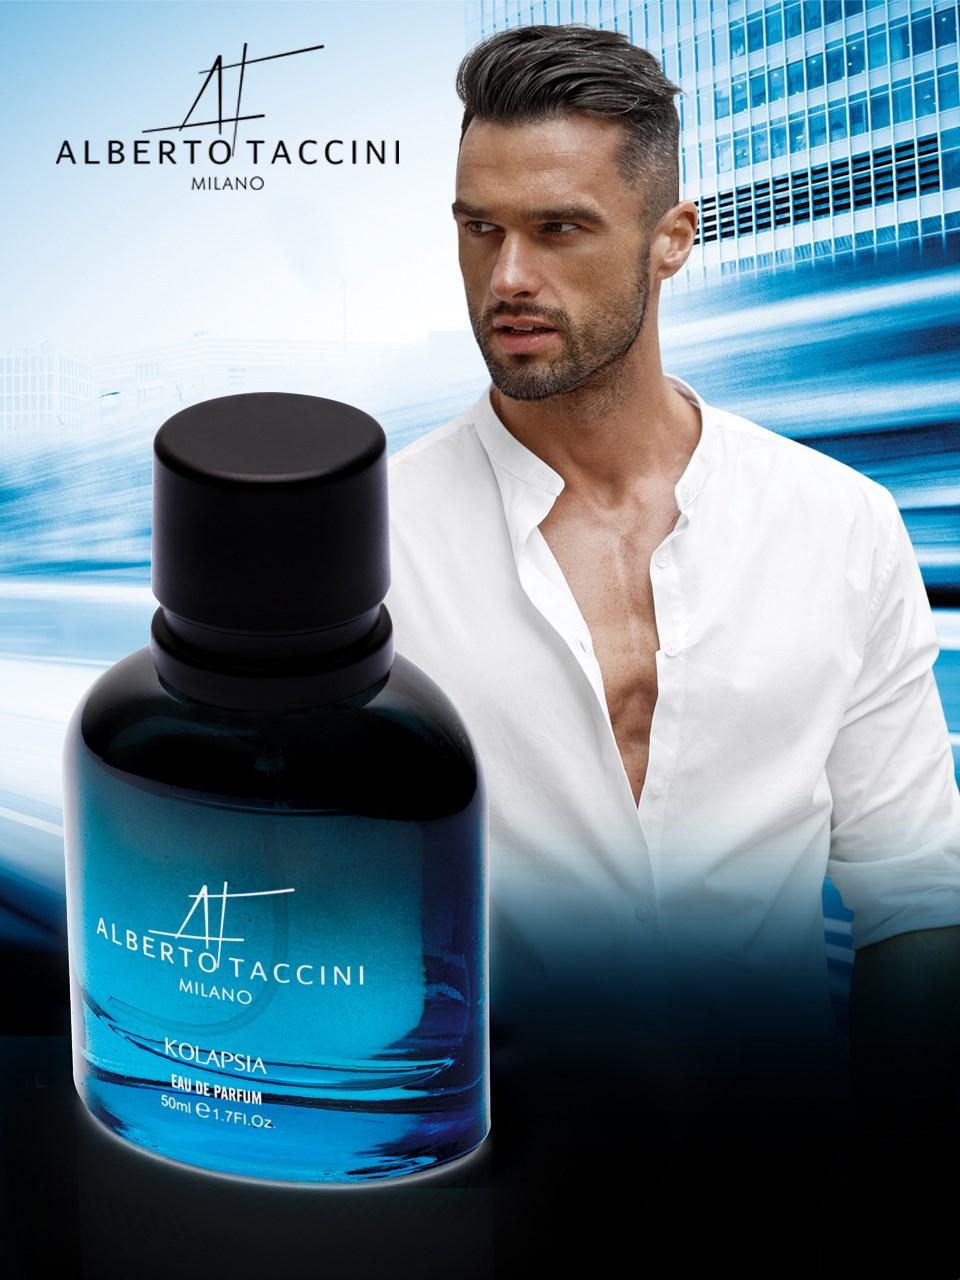 Kolapsia EDP Male Parfümü 50 ml male perfume cologne for men perfume men perfumes original man perfume branded|Deodorants & Antiperspirants| - AliExpress